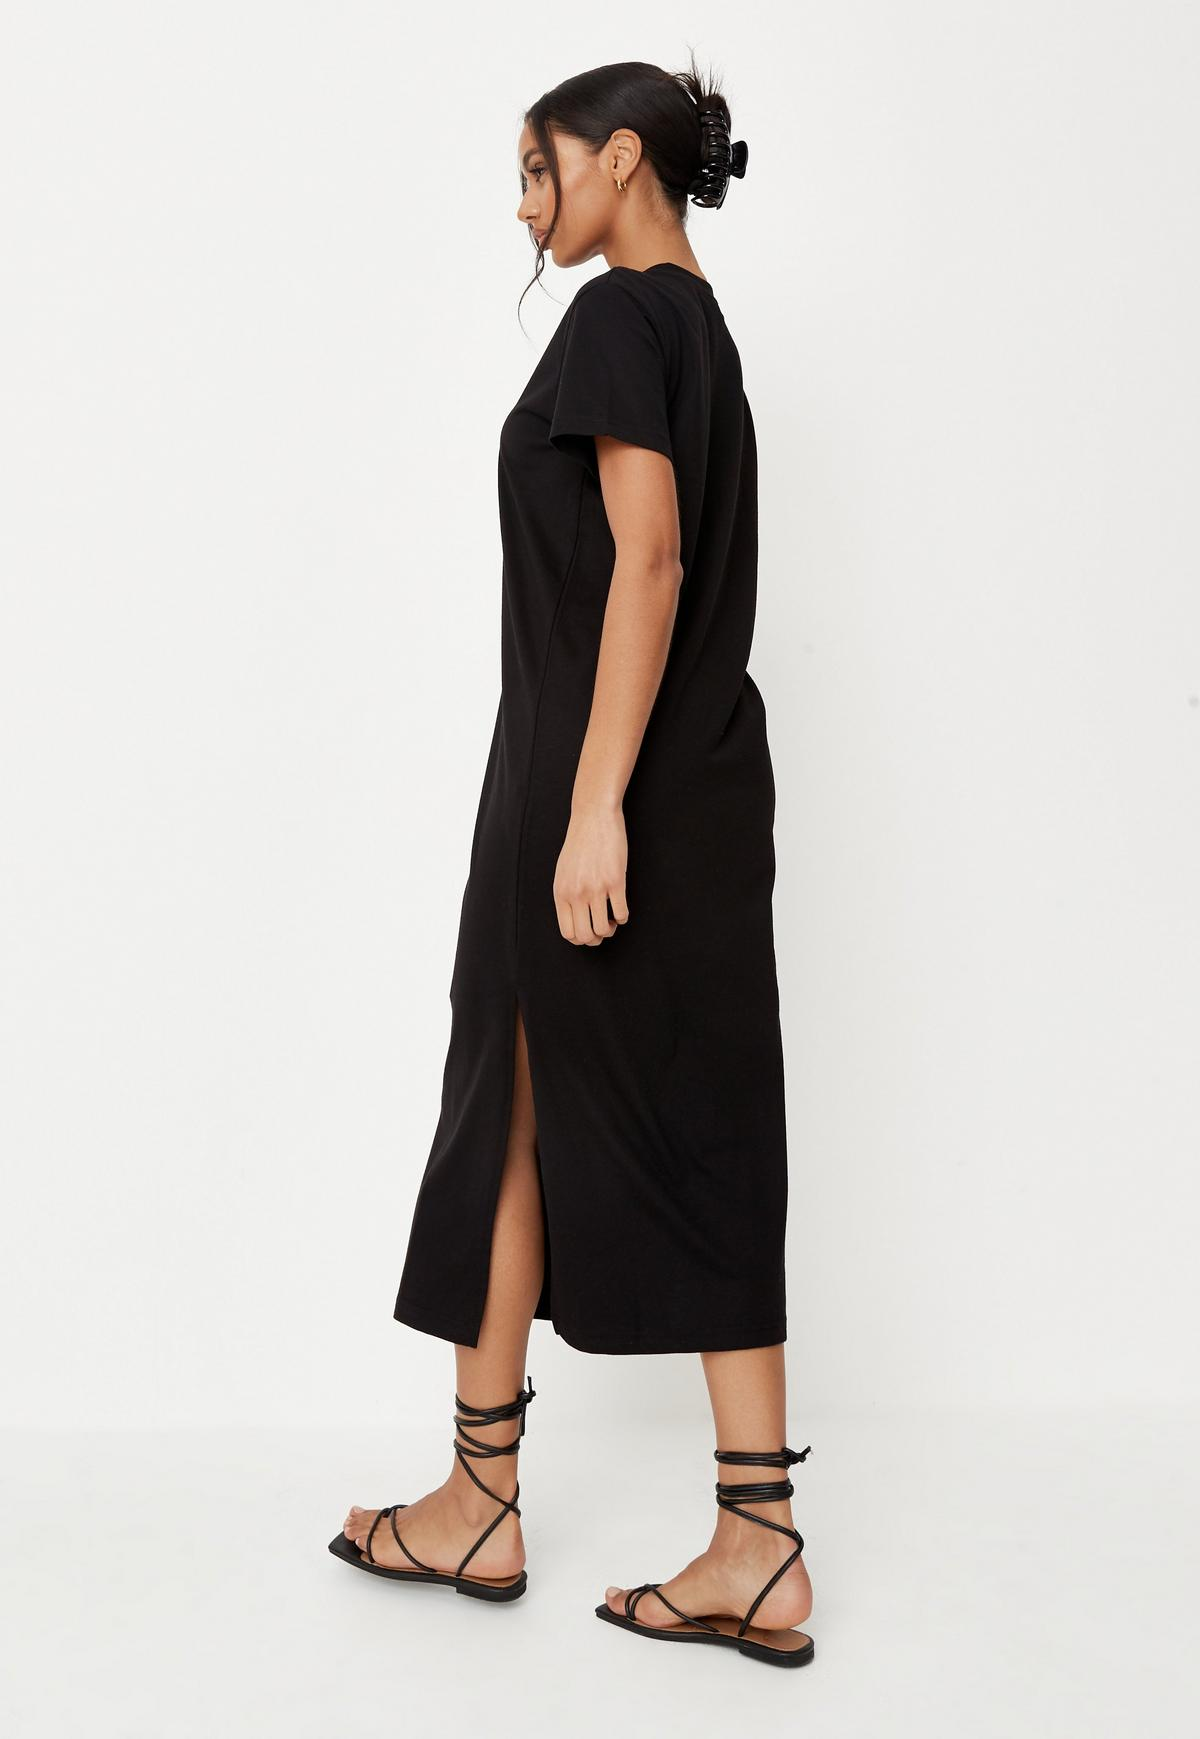 Basic Midi T Shirtkleid mit Schlitz in Schwarz